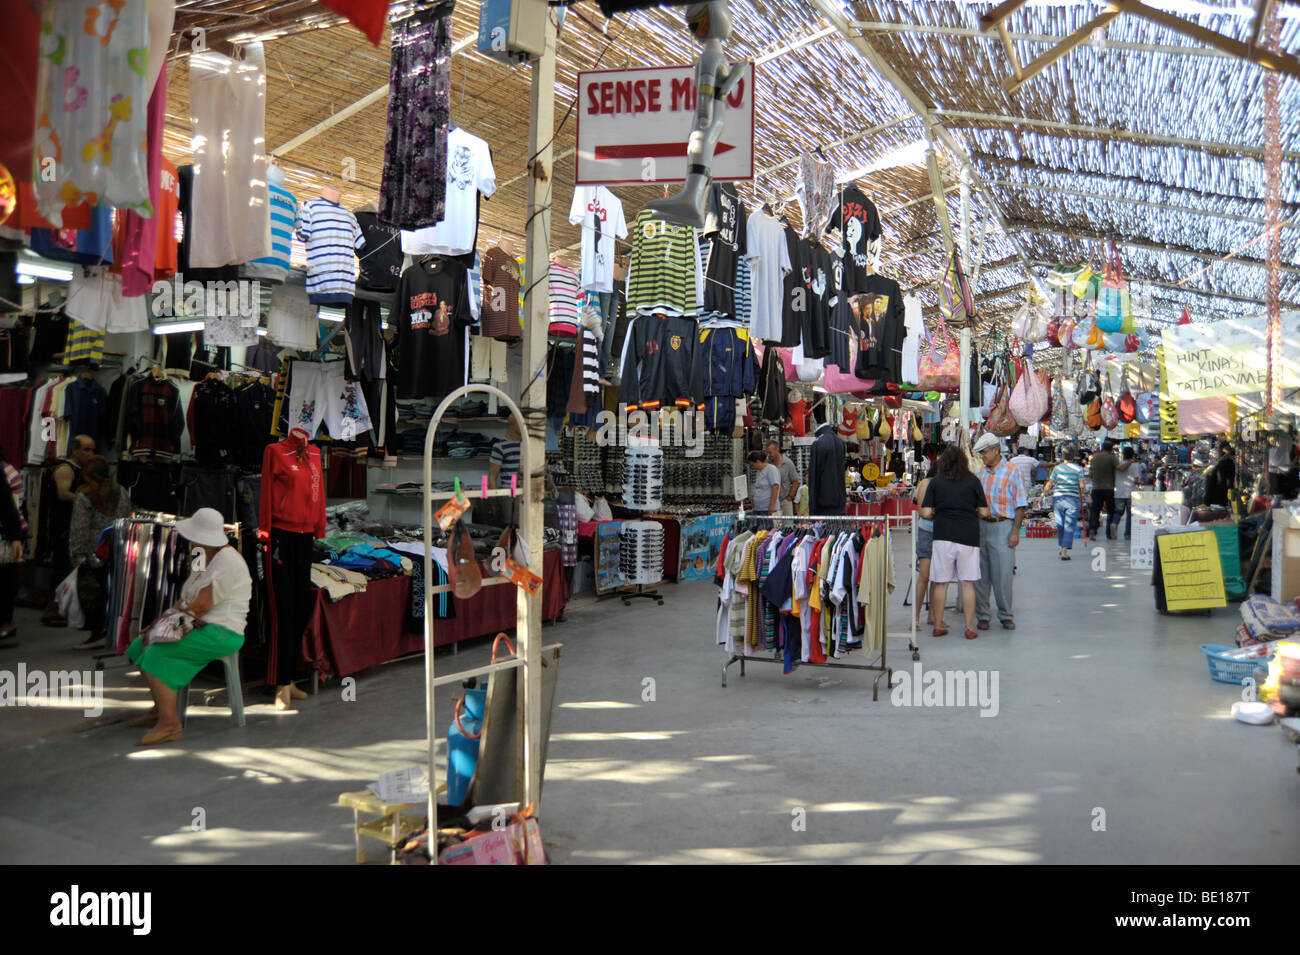 Bazaar with faked clothes near Kusadasi Turkey - Stock Image